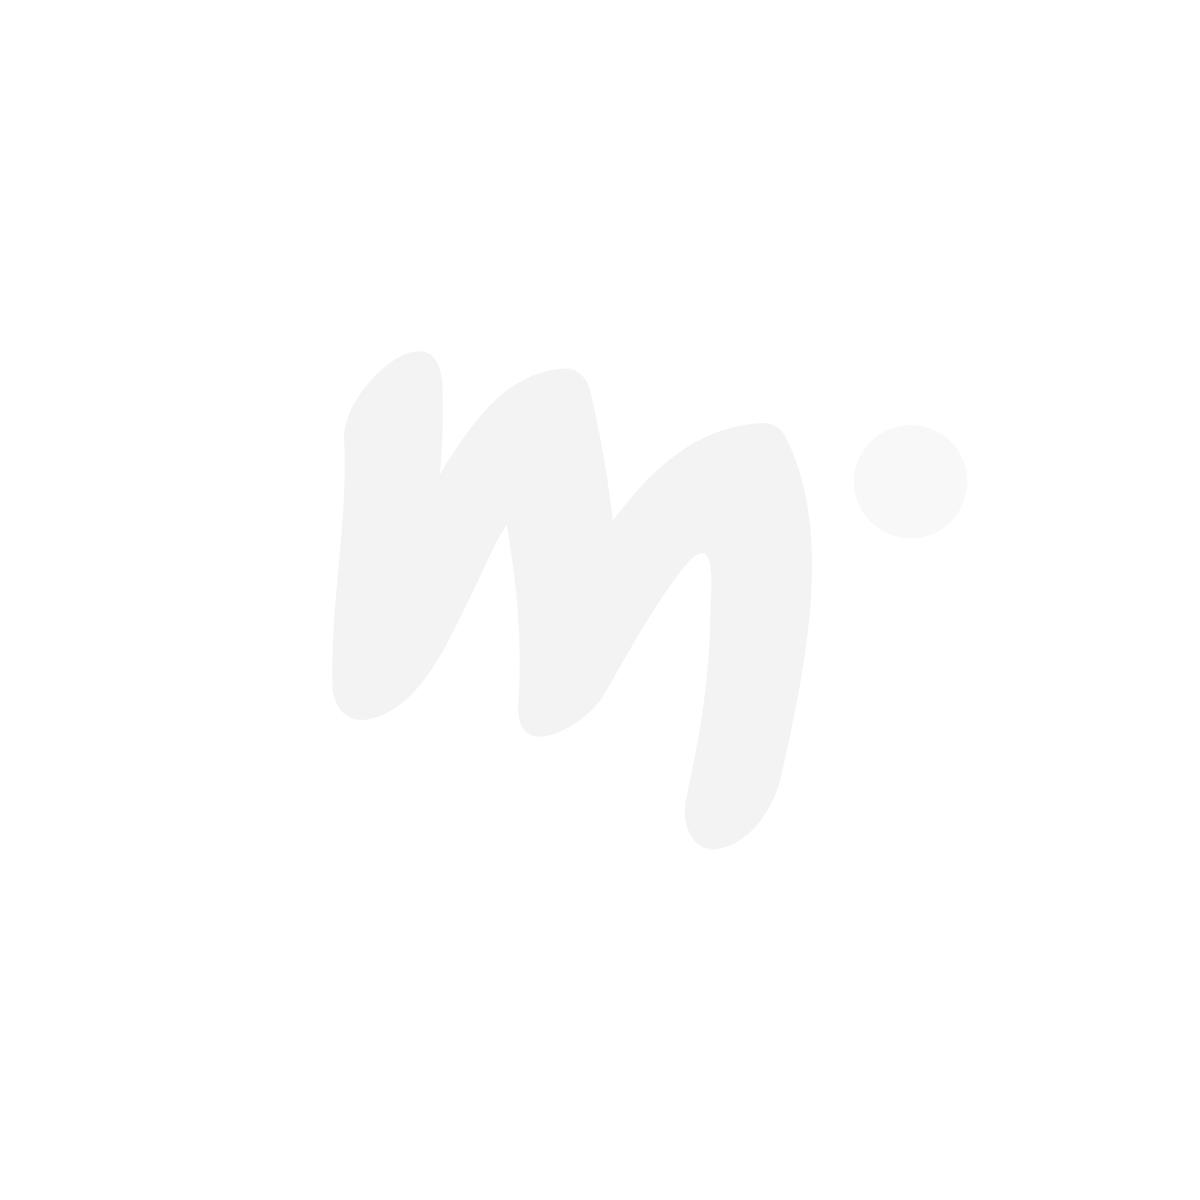 Peppi Pitkätossu Kuisti-tunika punainen